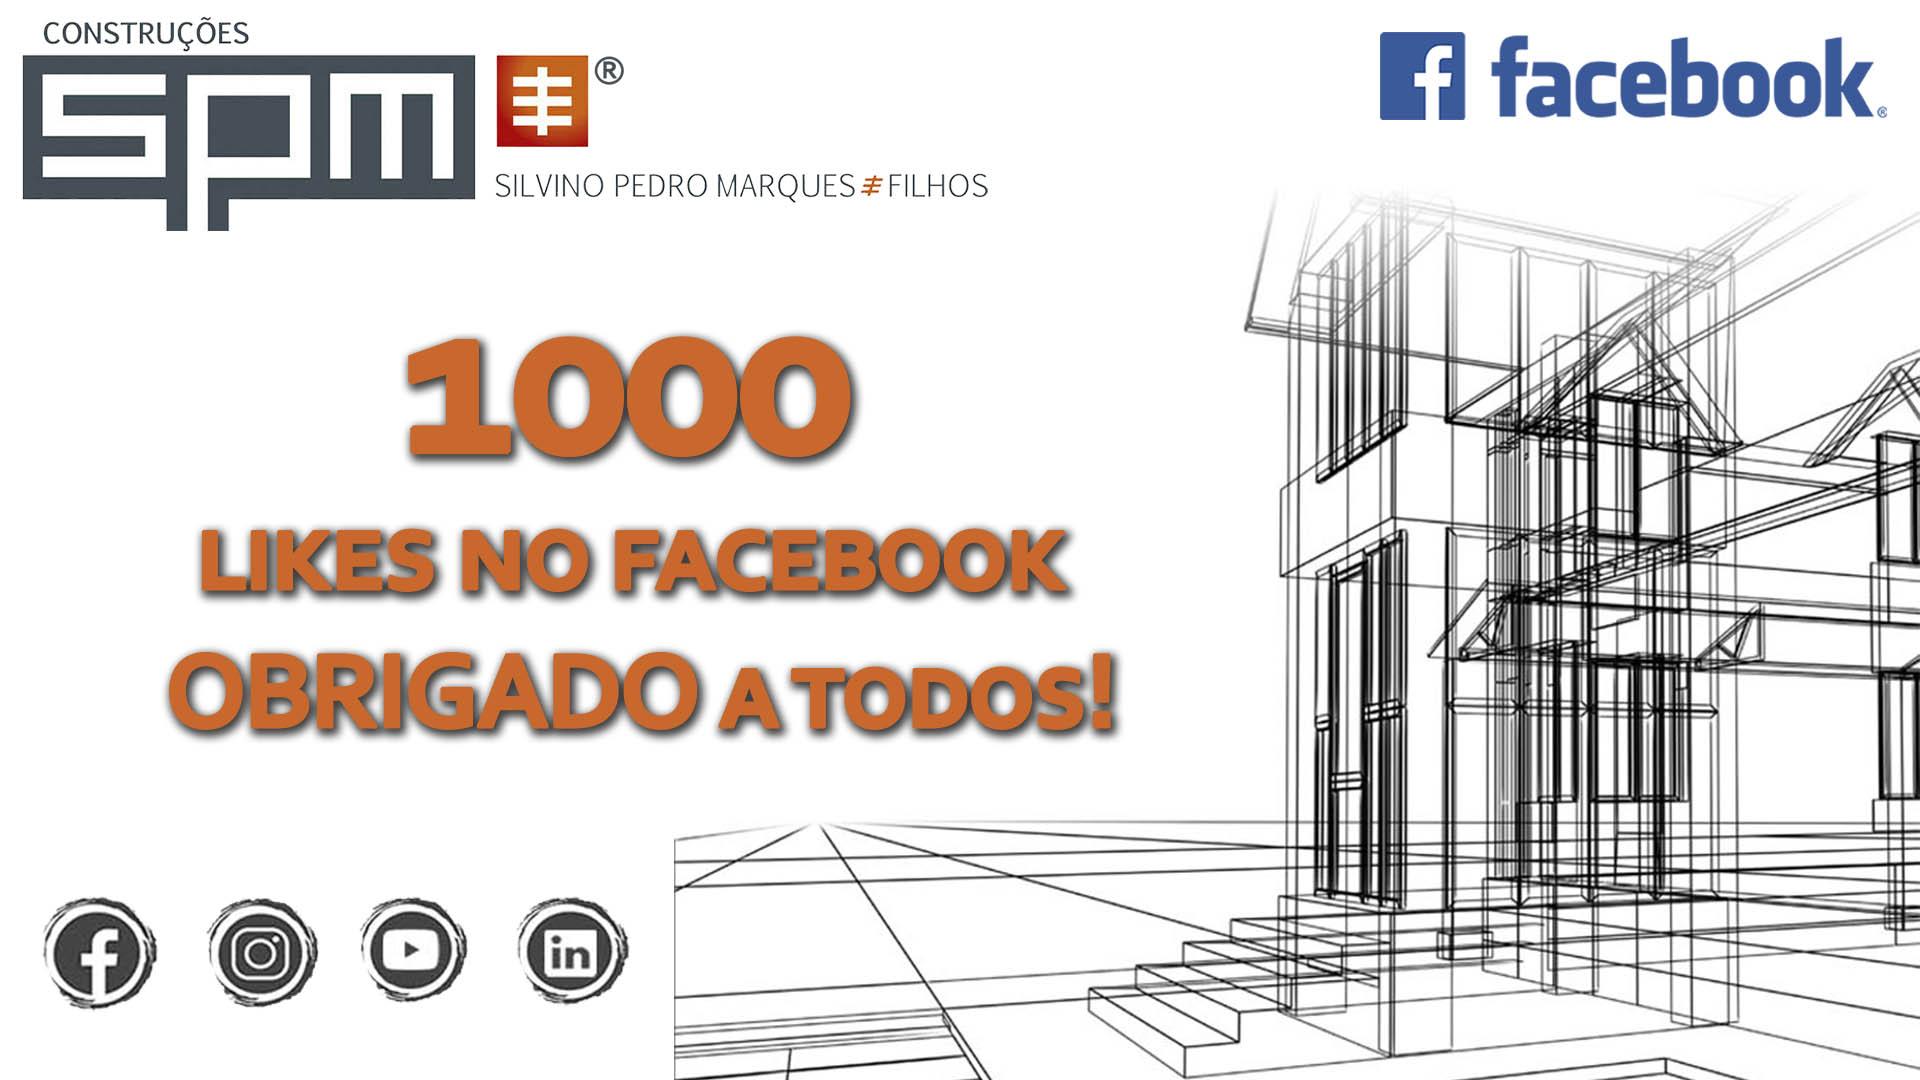 SPM | 1000 LIKES NO FACEBOOK, OBRIGADO!